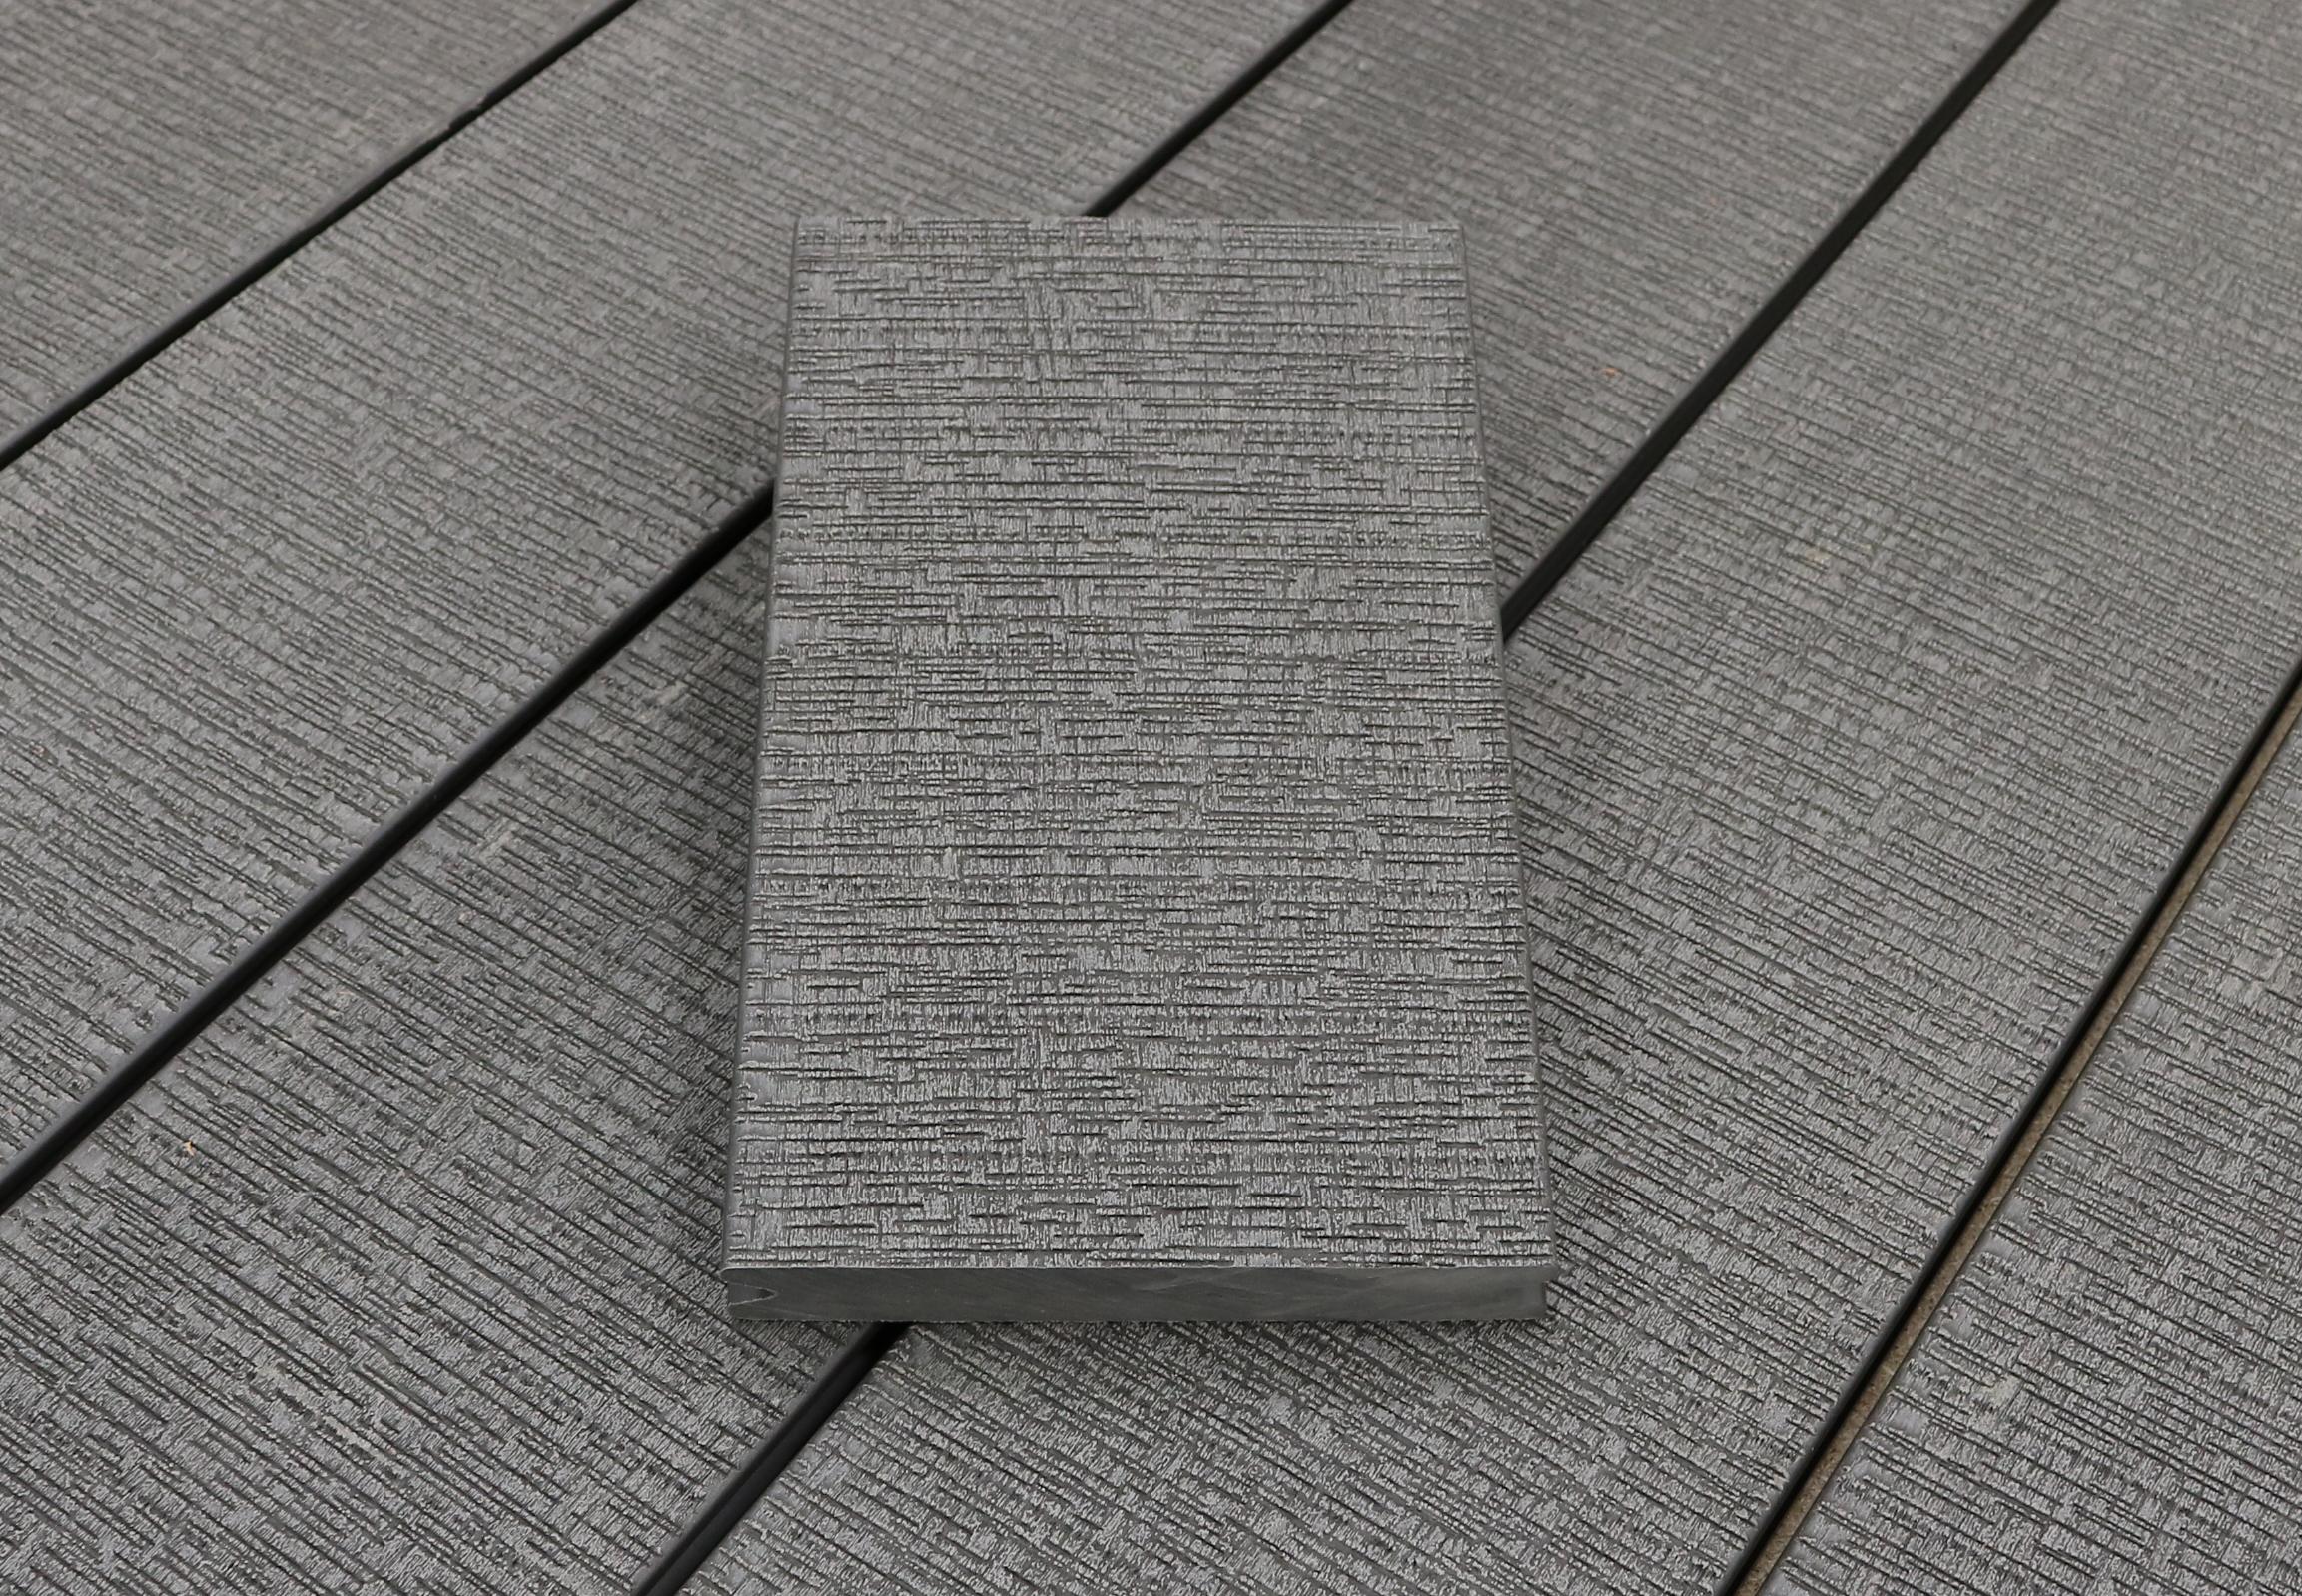 WPC Terrassendielen massiv, sägerau grob im Farbton hellgrau, Vollprofil, 22 x 143 bis 4800 mm für 7,95 €/lfm